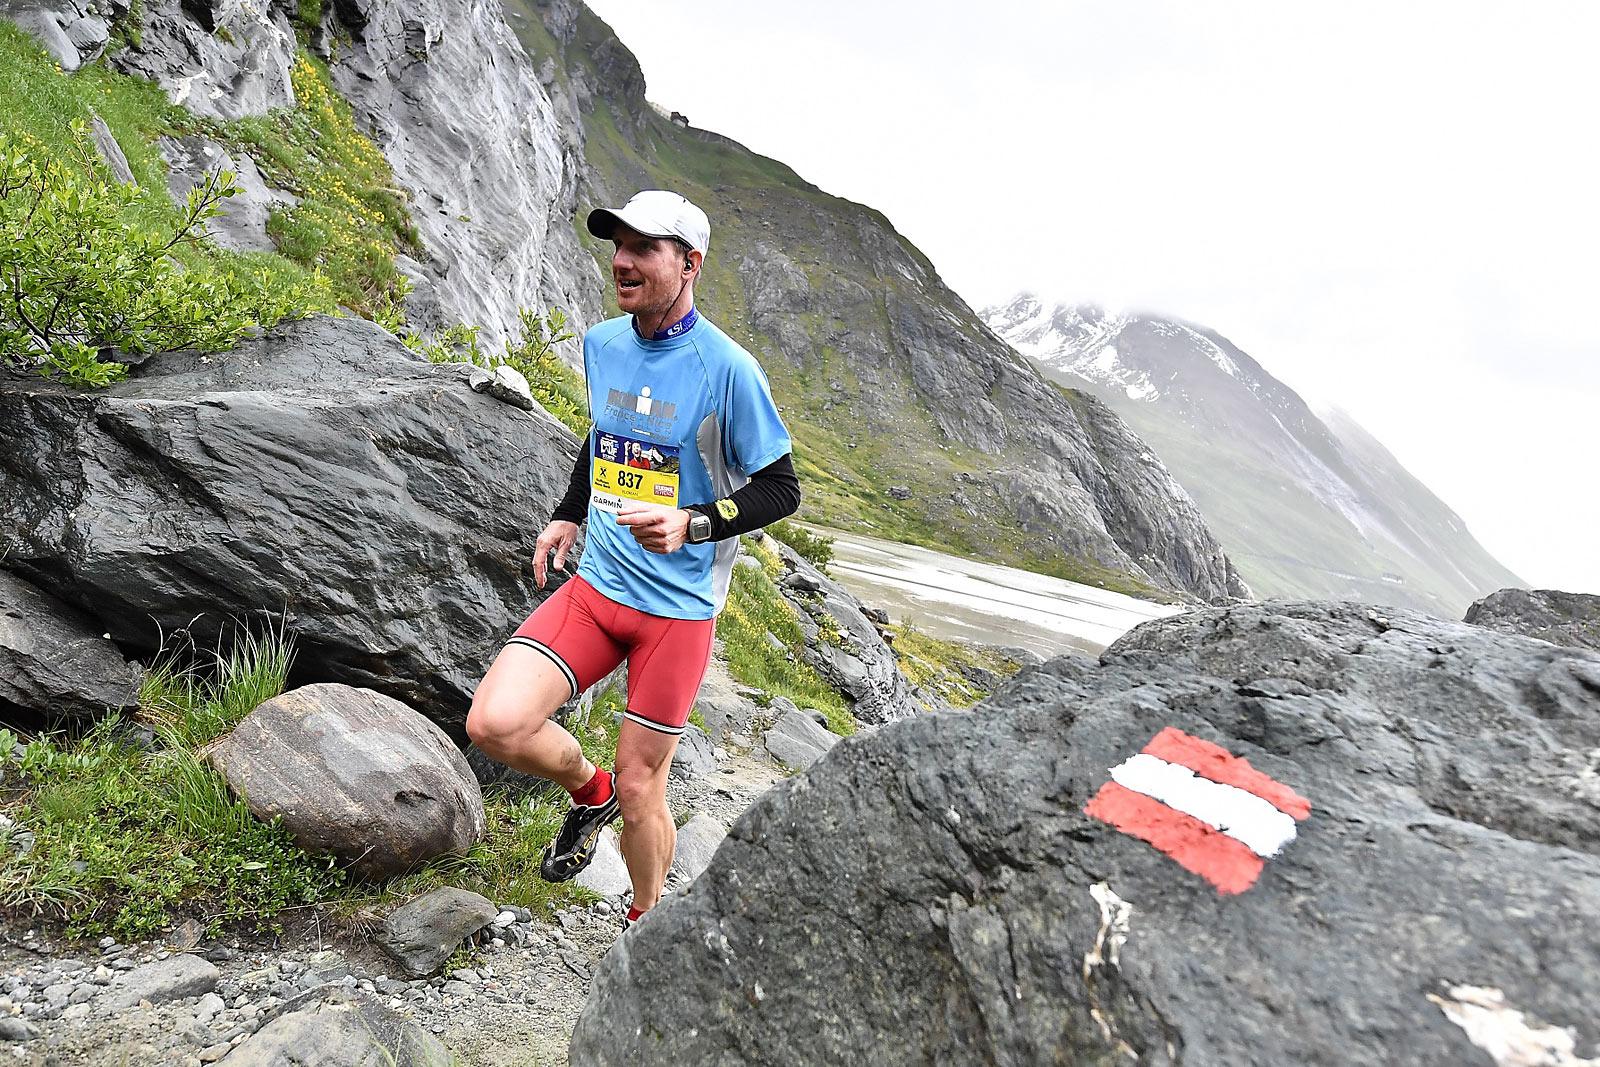 Flo Holzmann –Sportograf